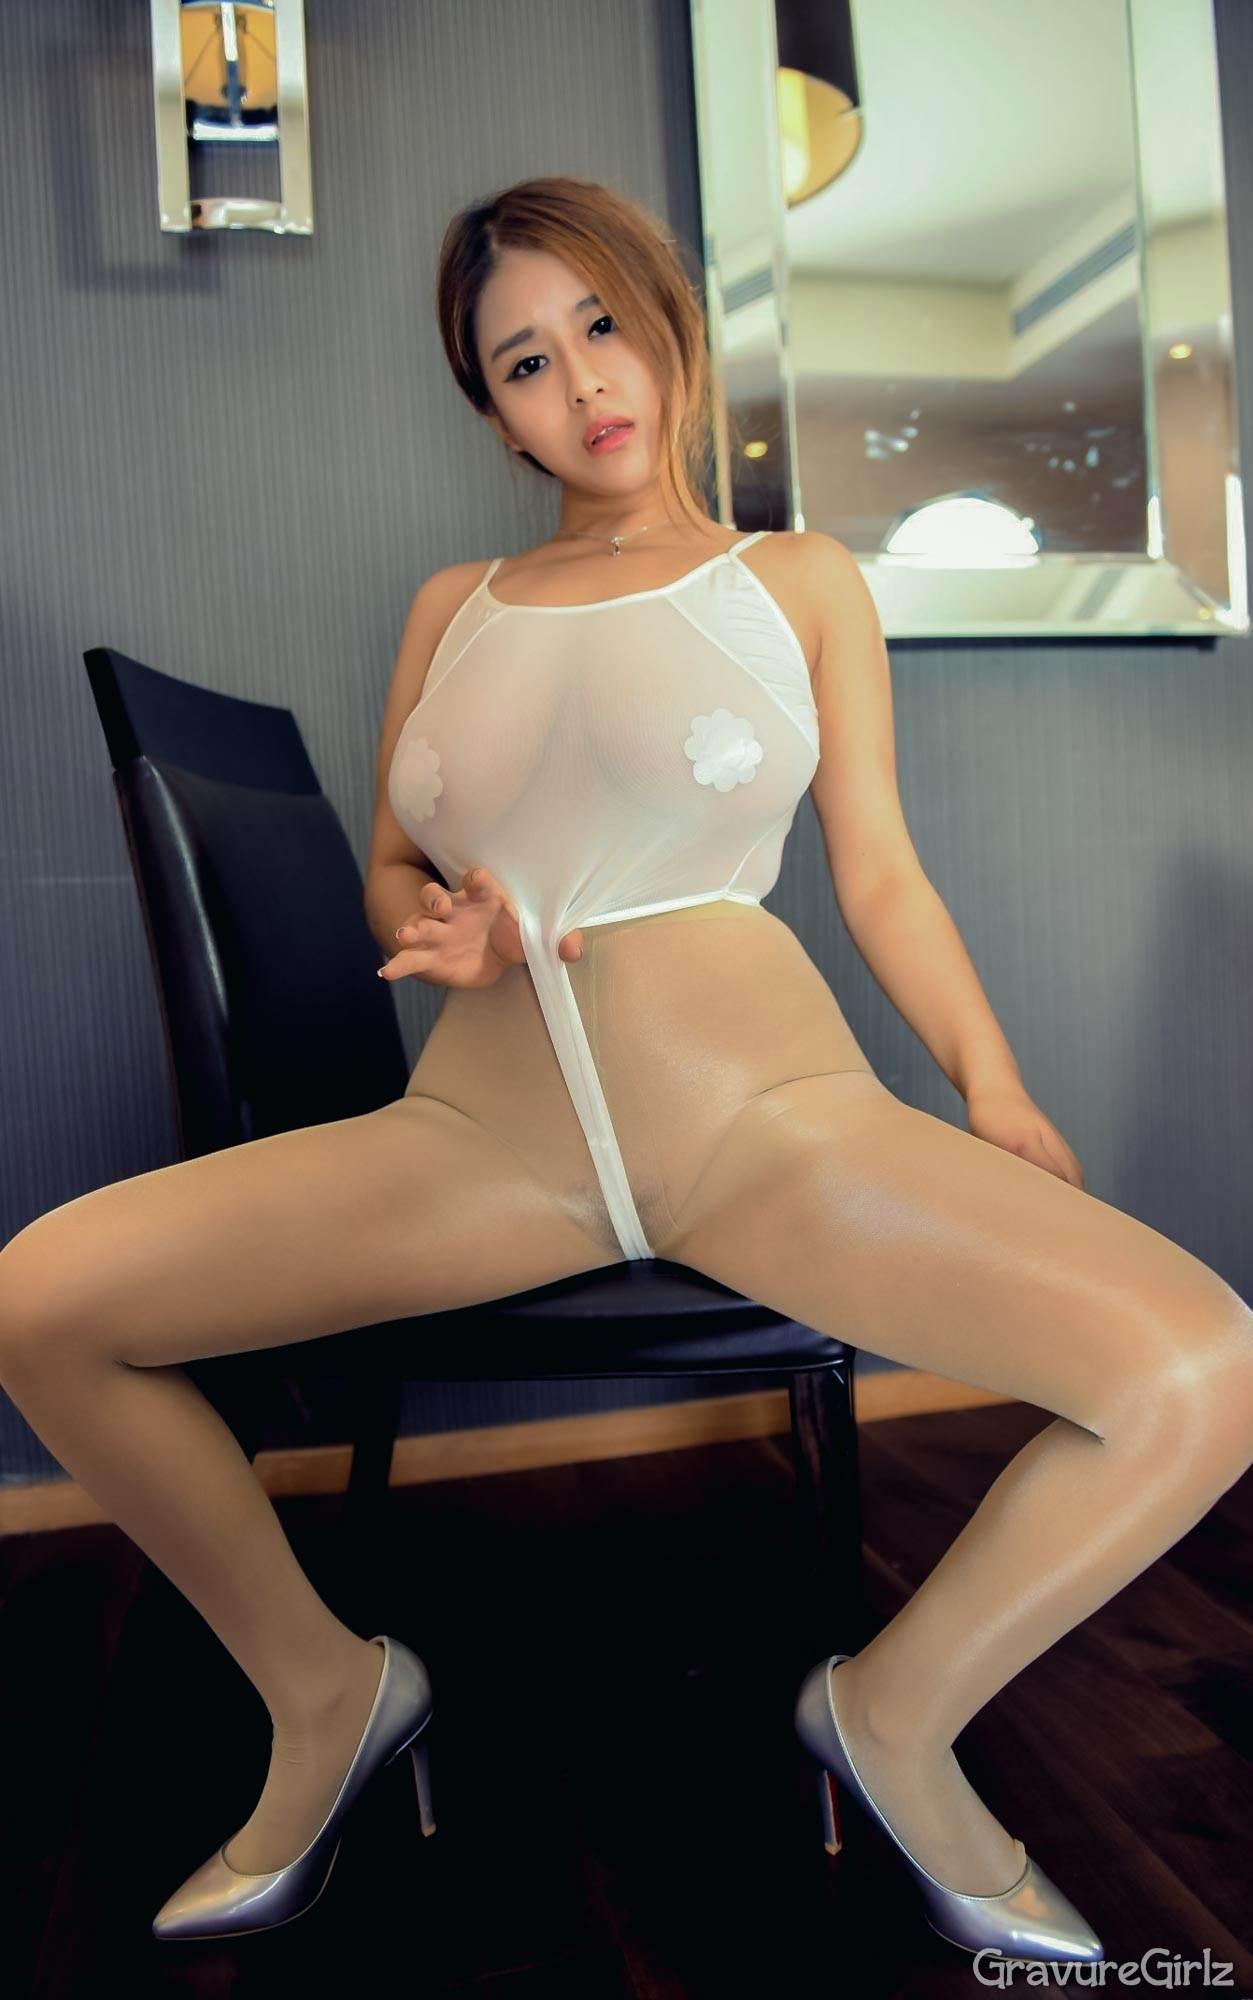 Asian model nude dance 2 10